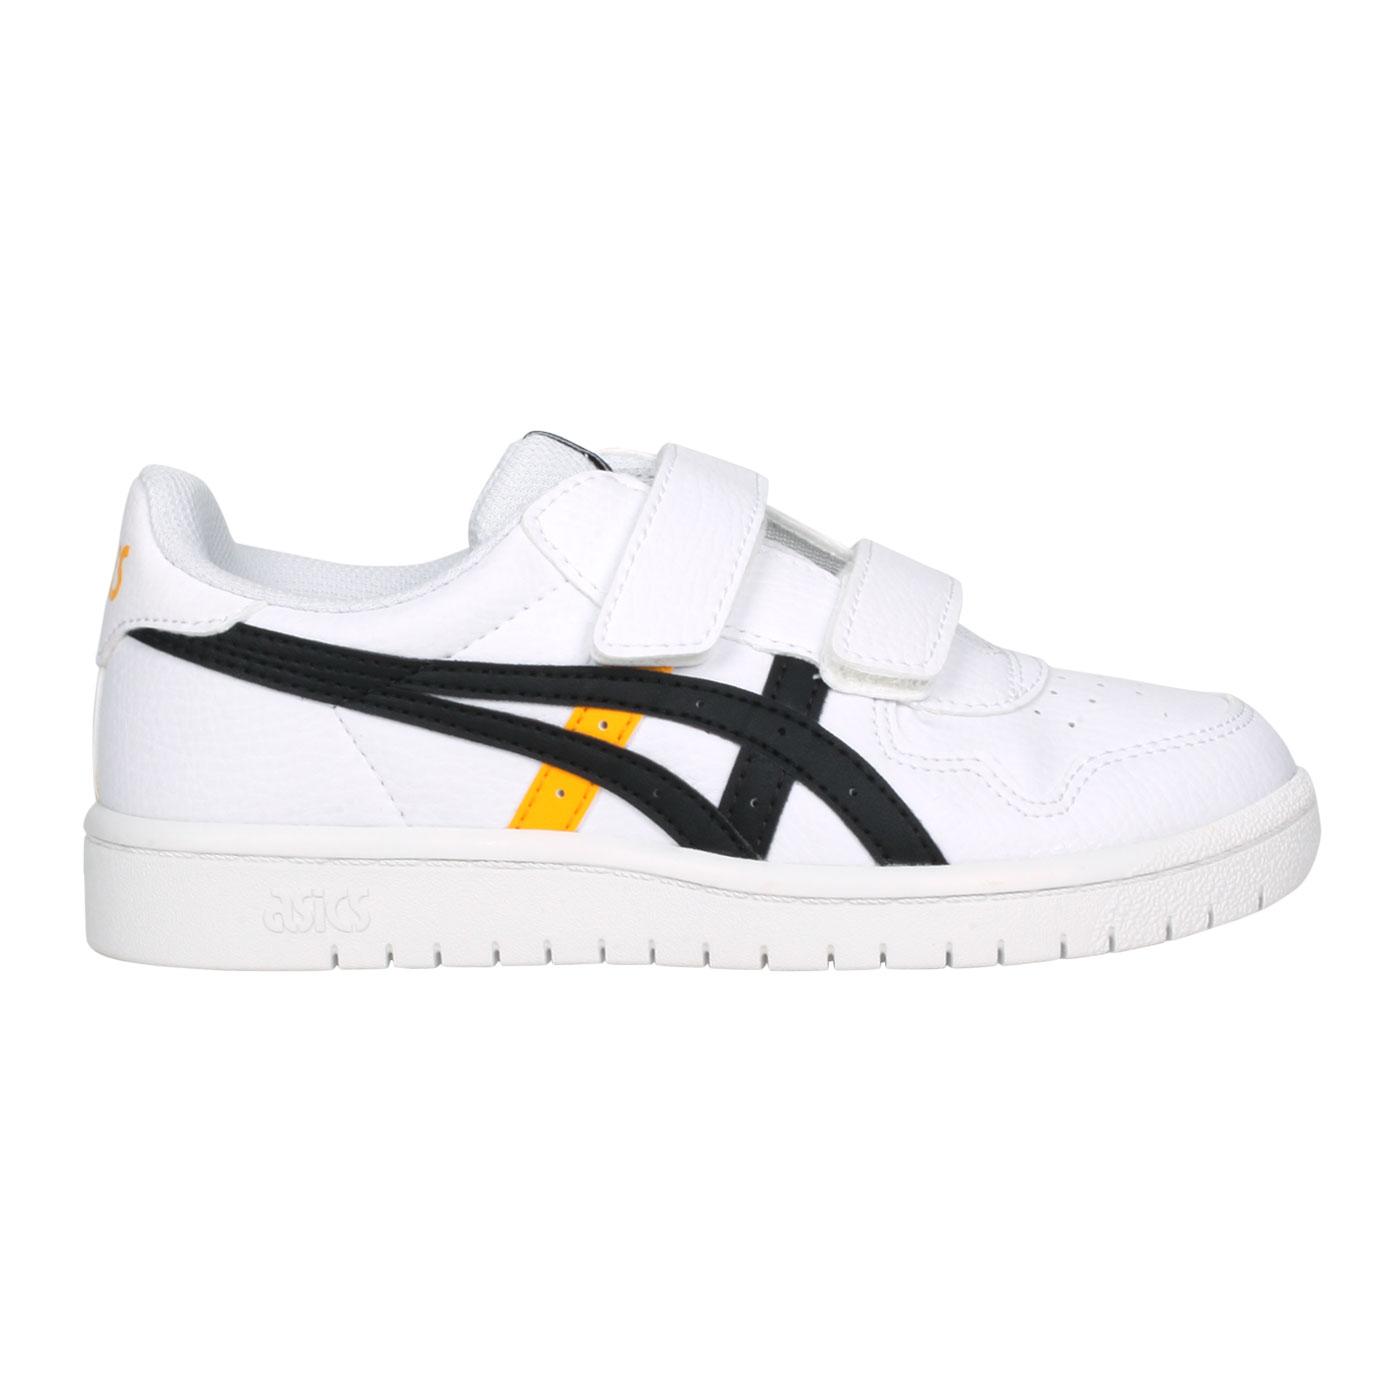 ASICS 大童運動鞋   @JAPAN S PS@1204A008-102 - 白黑黃